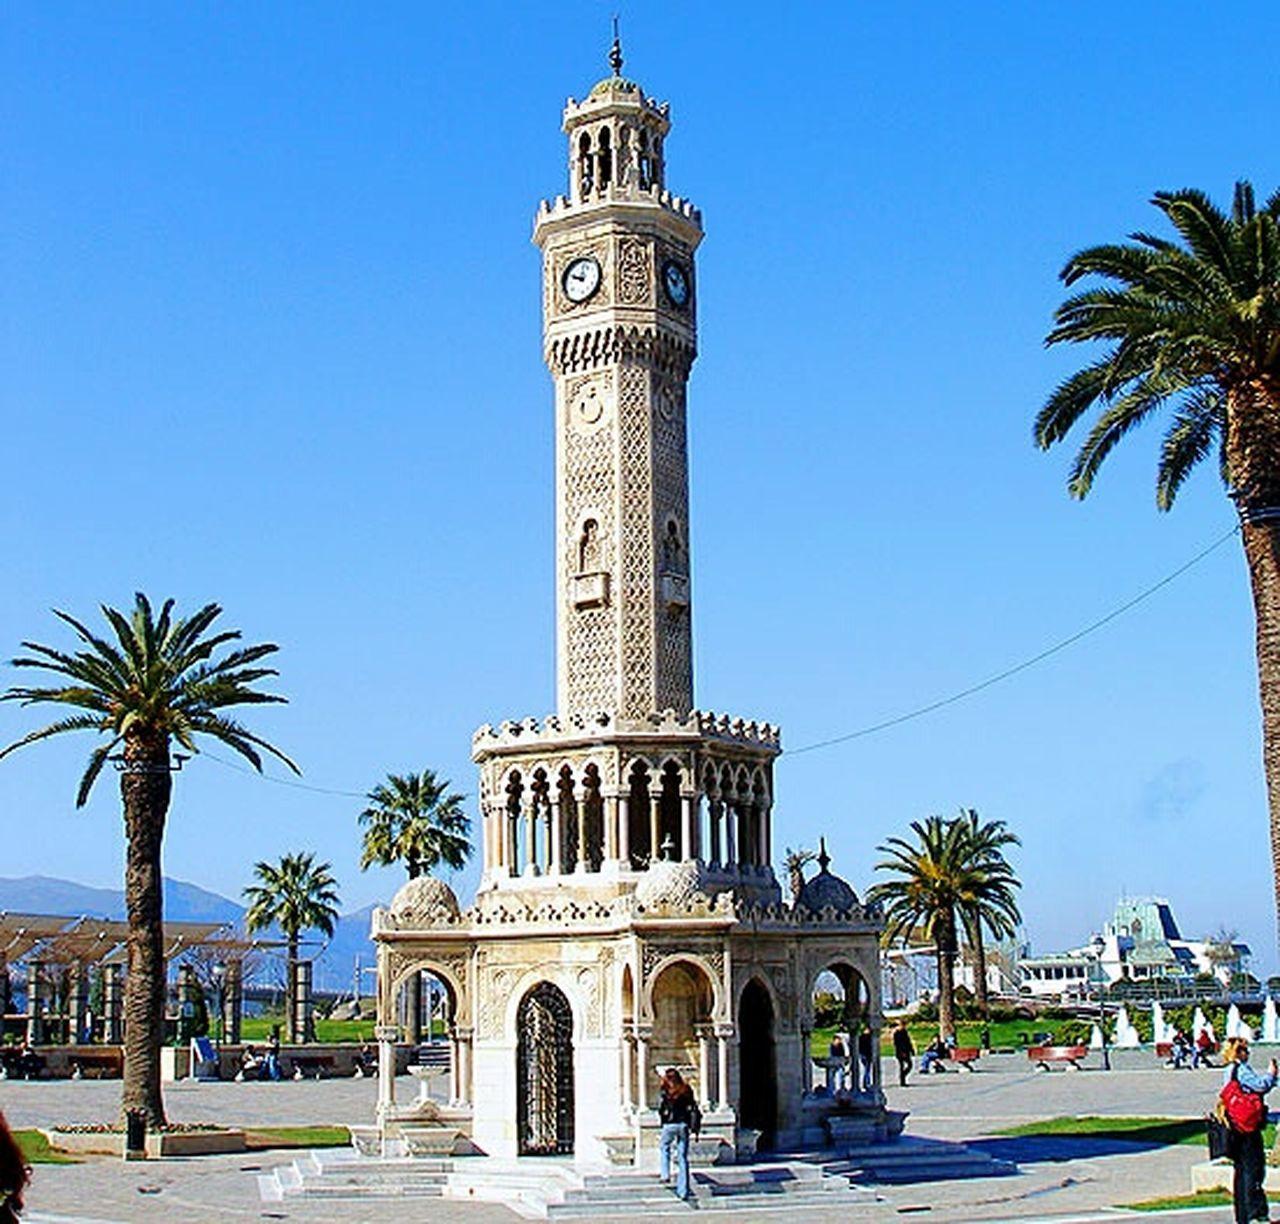 İZMİR Clock Tower Izmir City Clocktower Outdoors Architecture Day